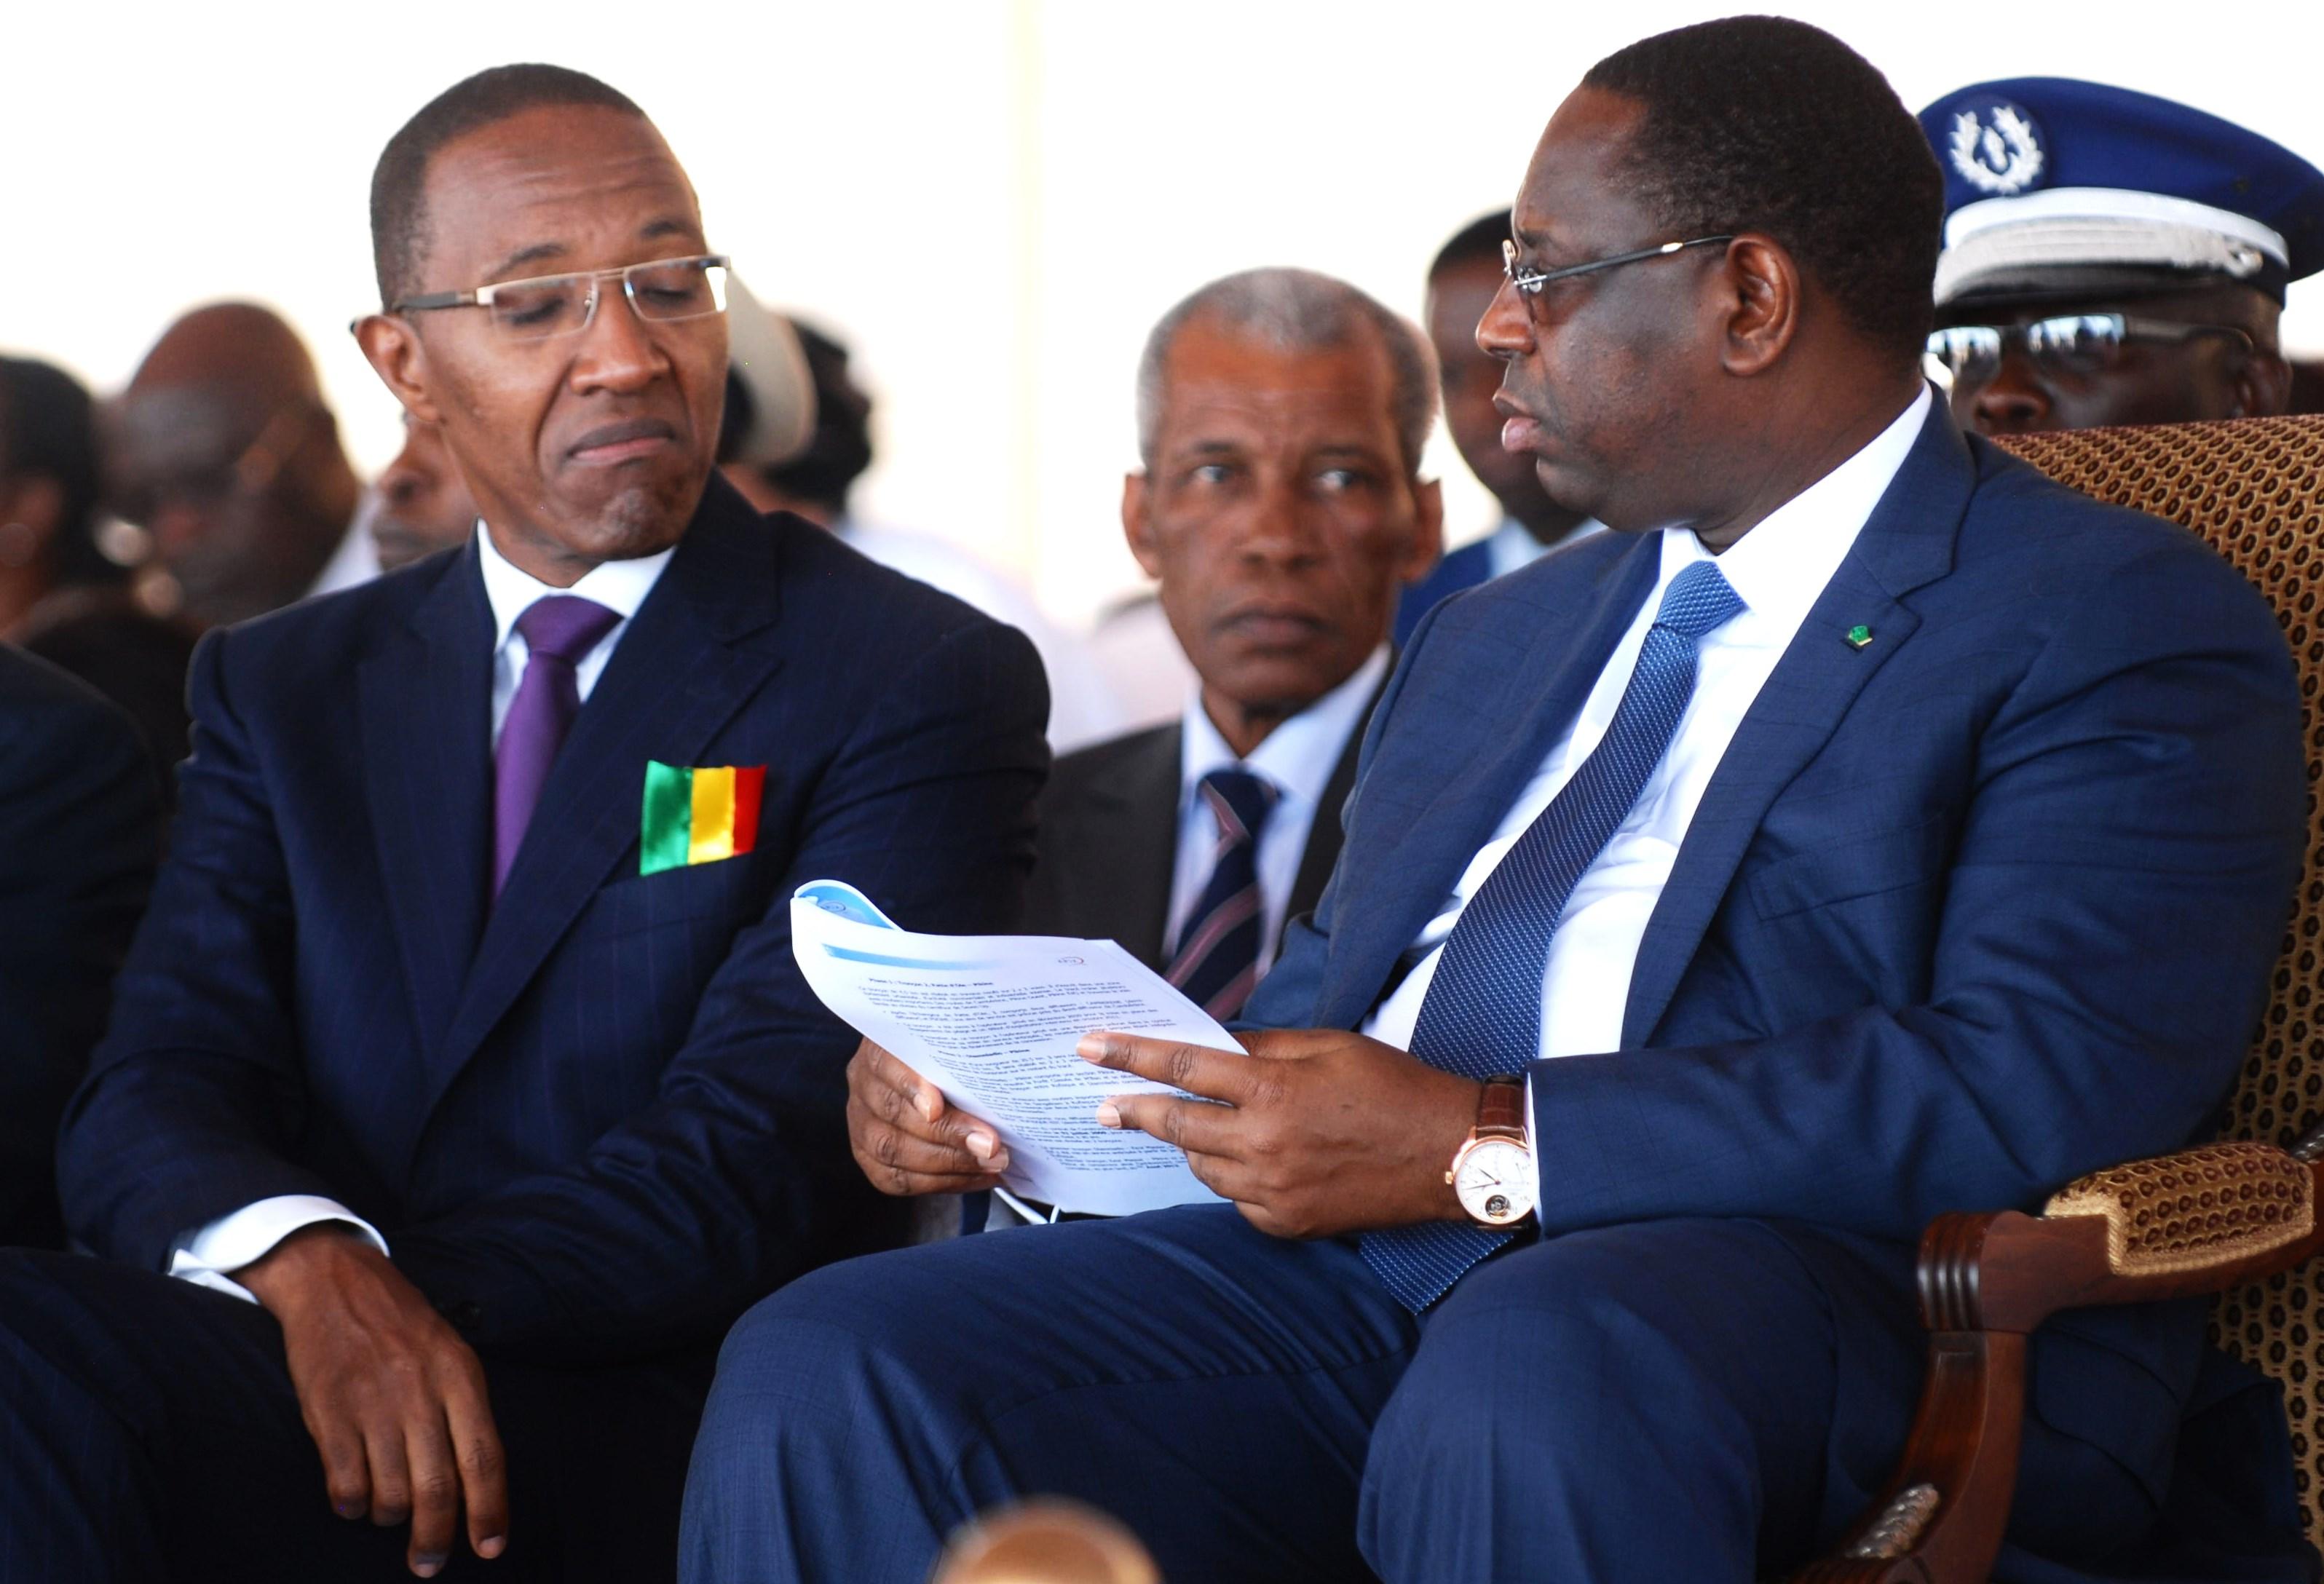 Macky Sall vs Abdoul Mbaye : les germes explosifs d'un duel